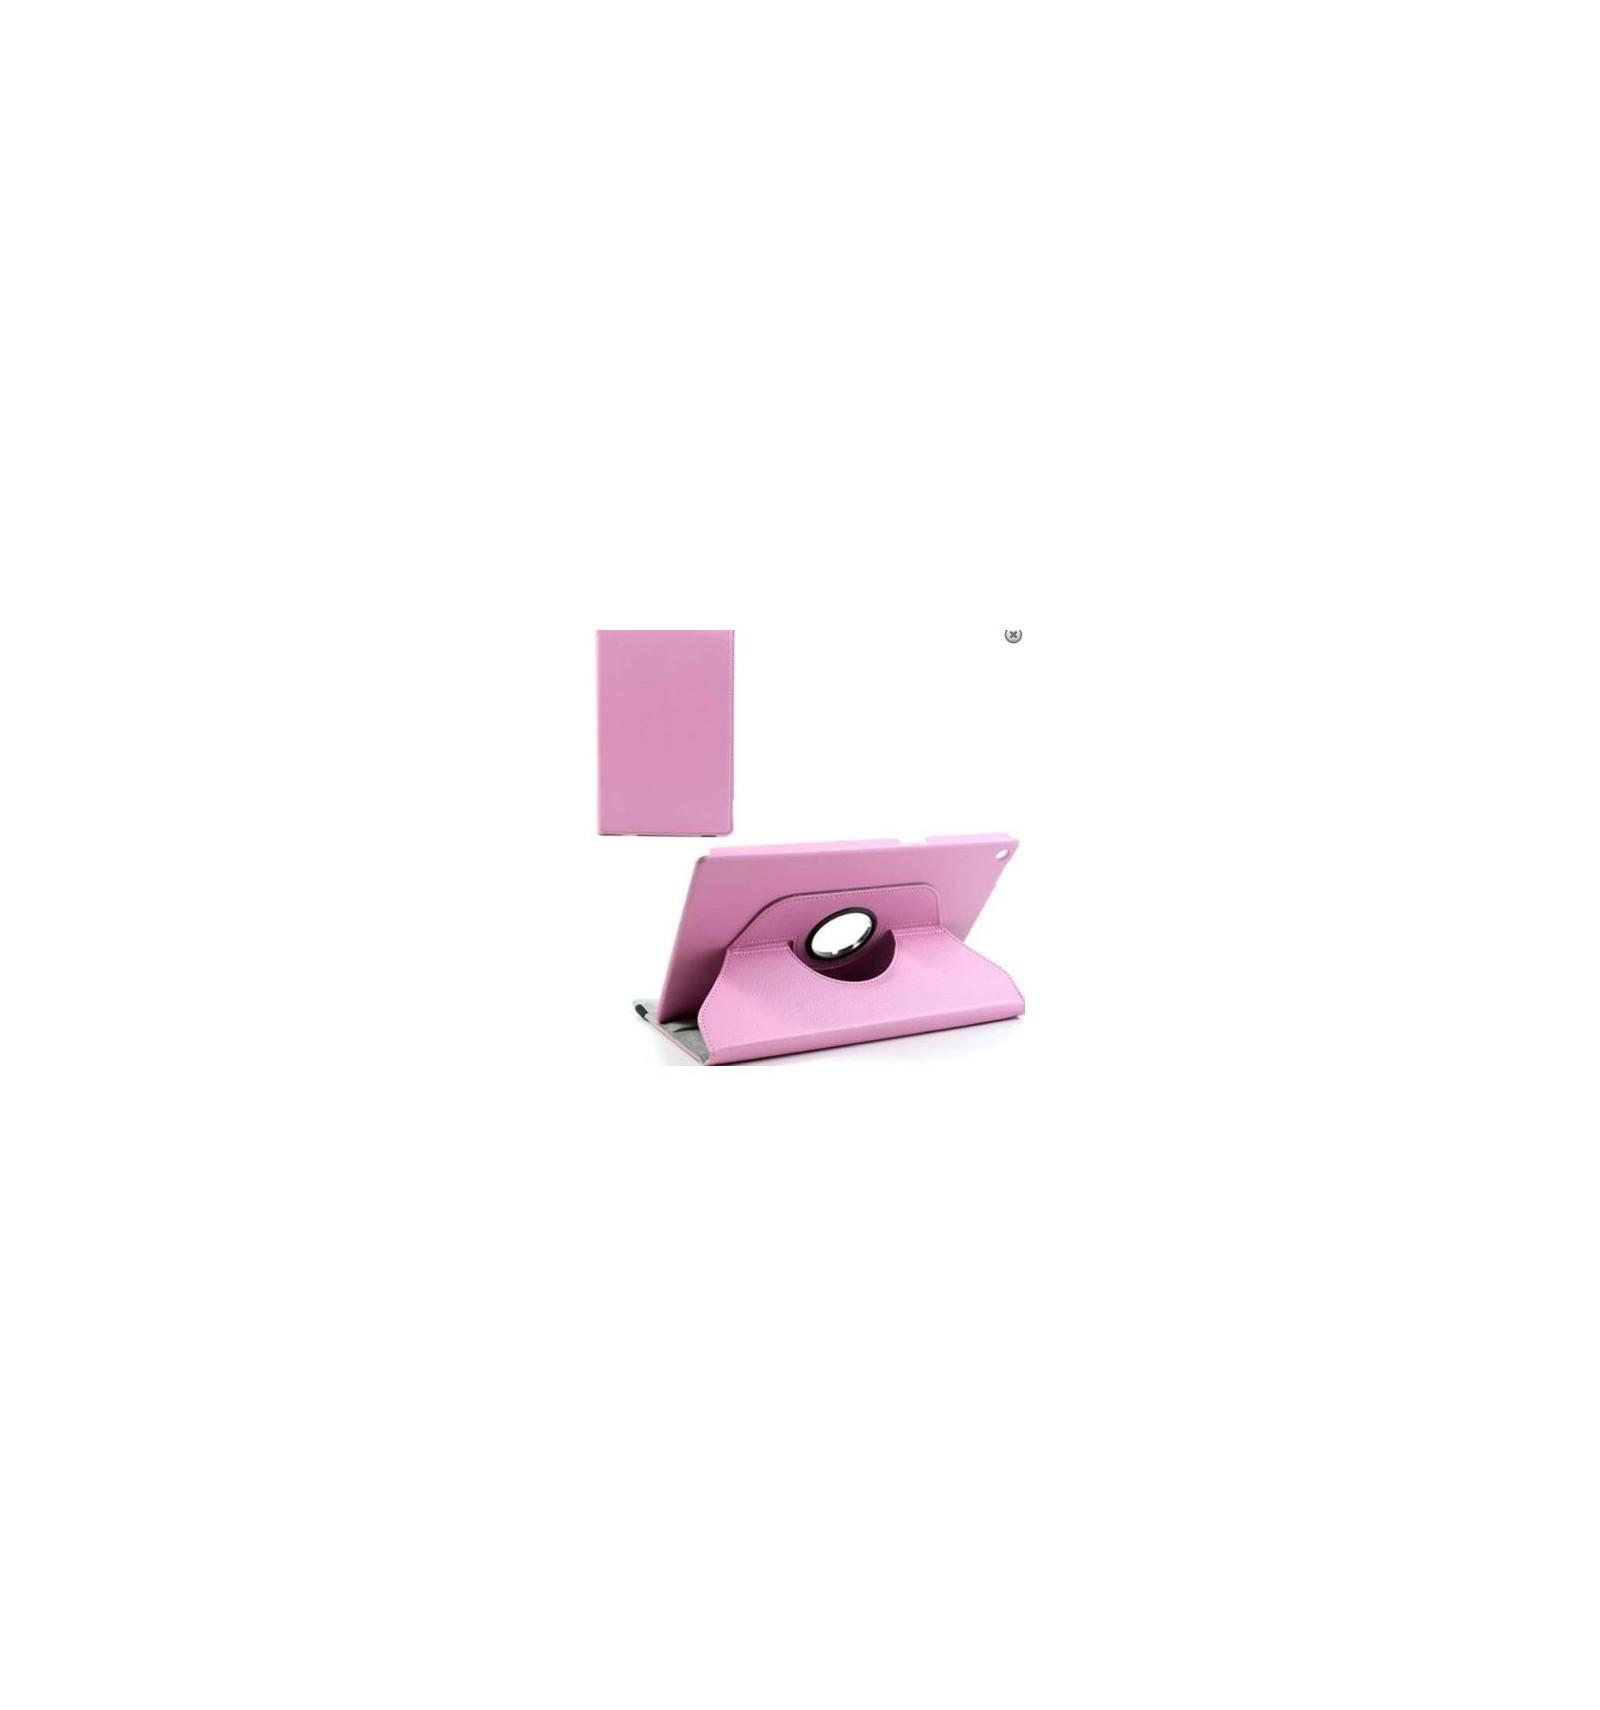 Sony xperia z funda giratoria 360 rosa claro - Funda xperia z tablet ...